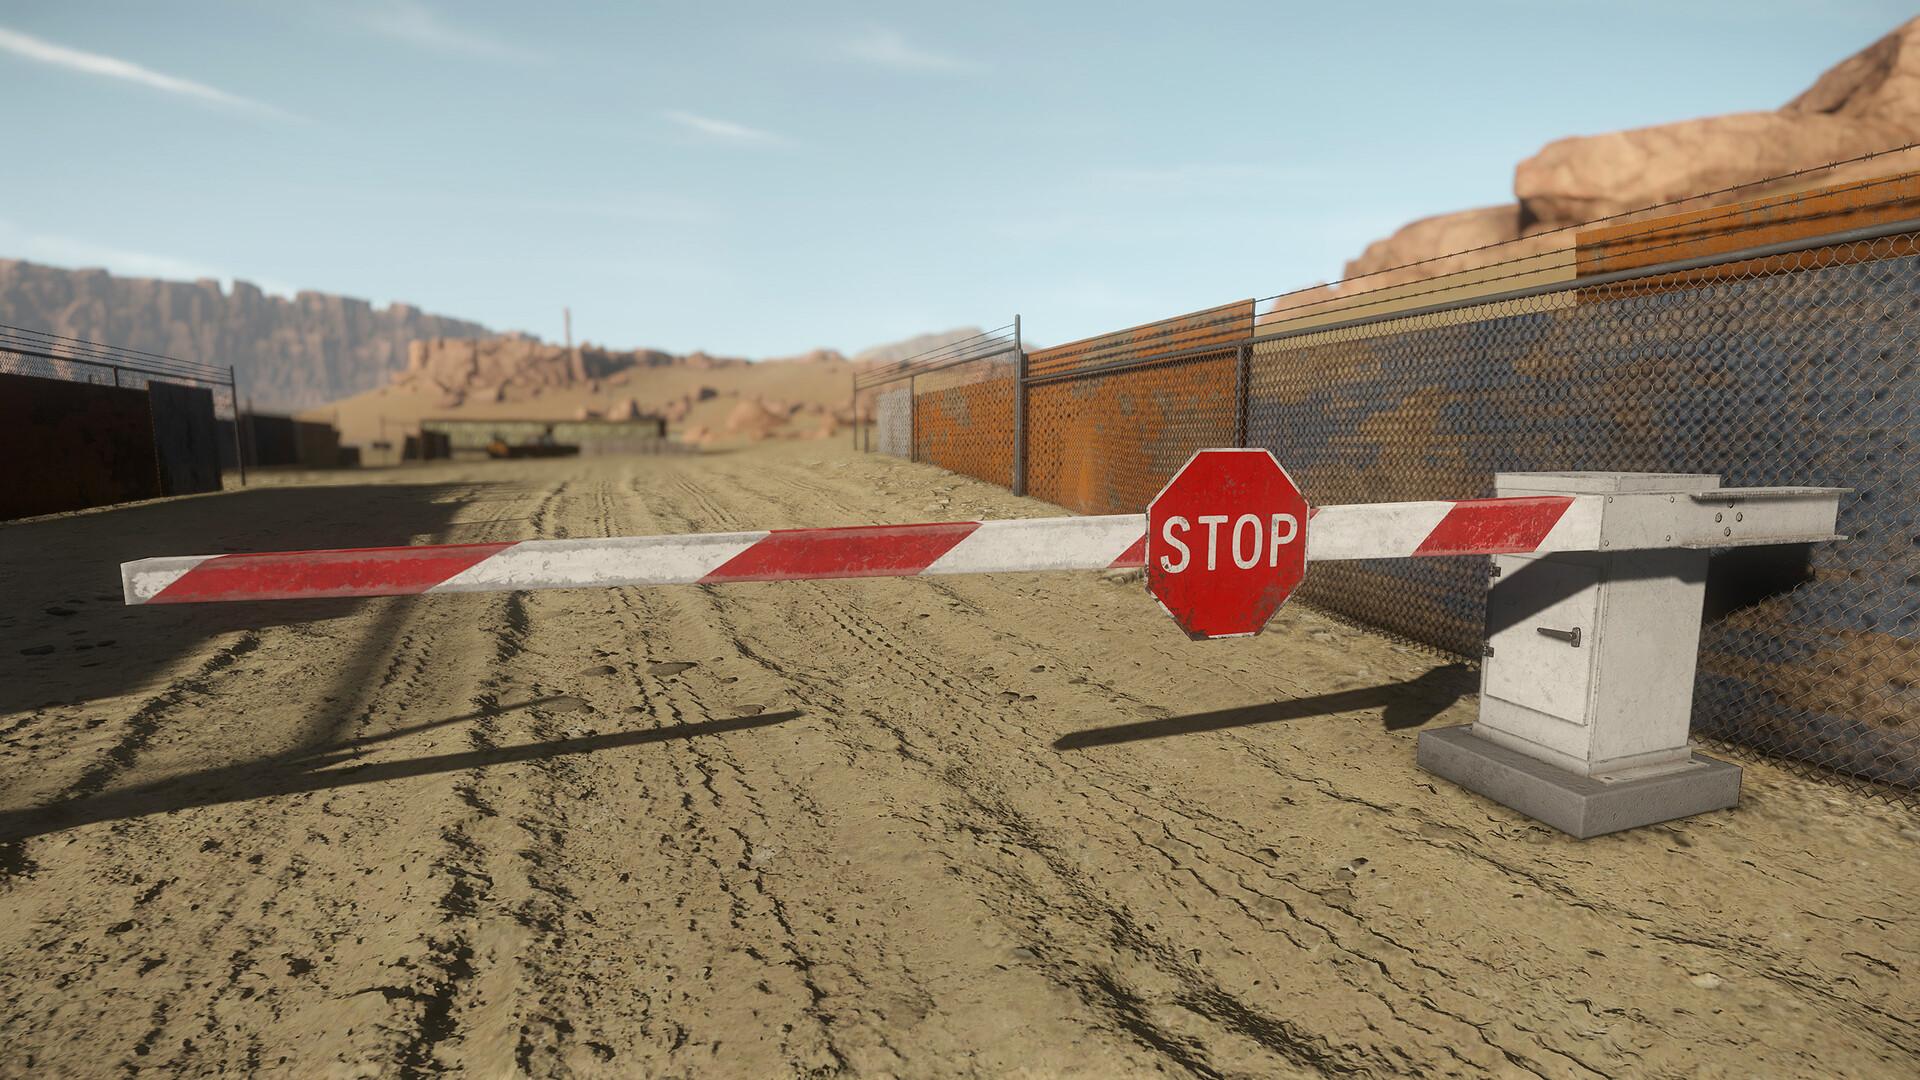 Carl kent checkpoint gate 3